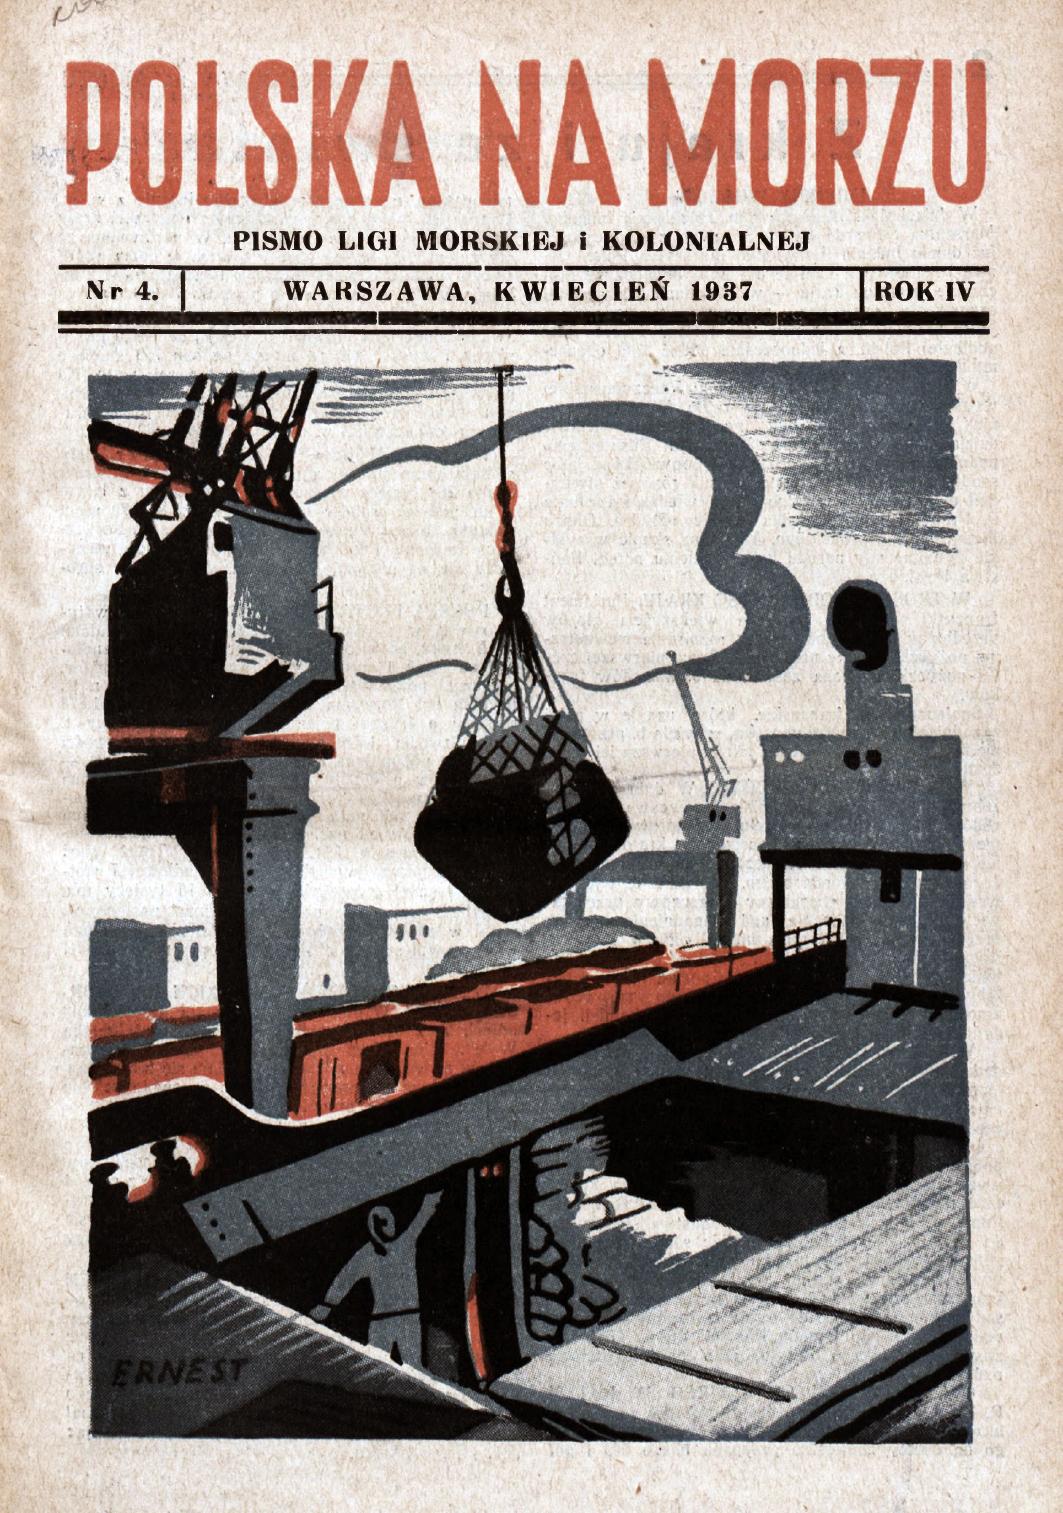 Polska na Morzu : pismo Ligi Morskiej i Kolonjalnej. - Liga Morska i Kolonjalna, 1937, nr 4